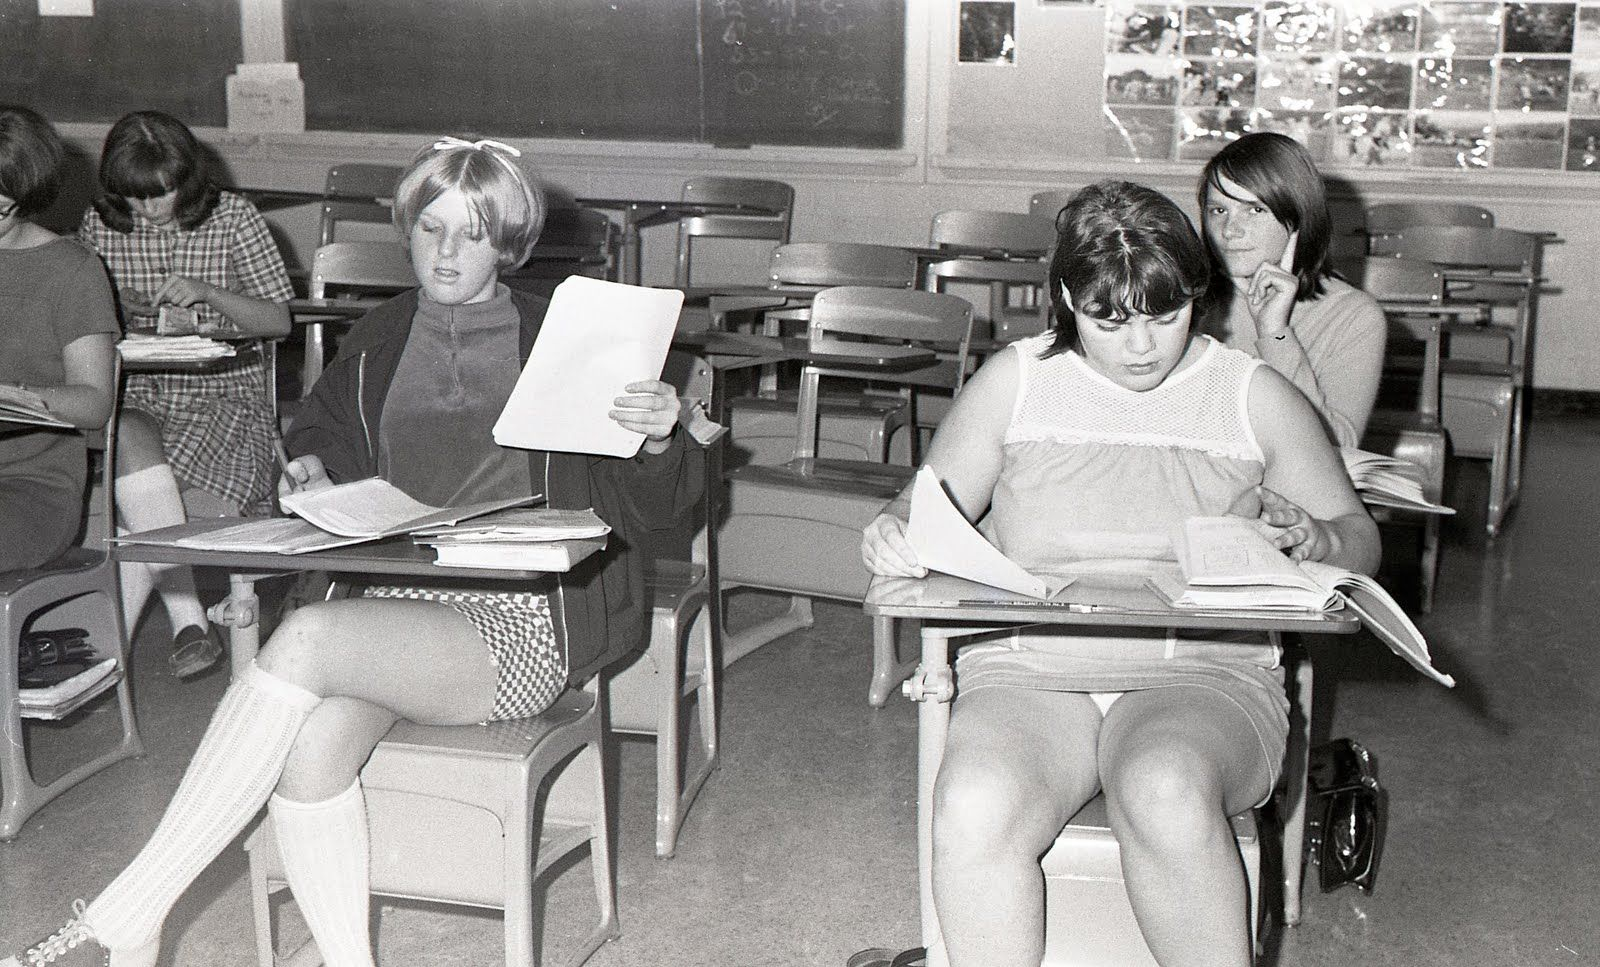 Absolutely agree Teachers in mini skirts sitting still that?